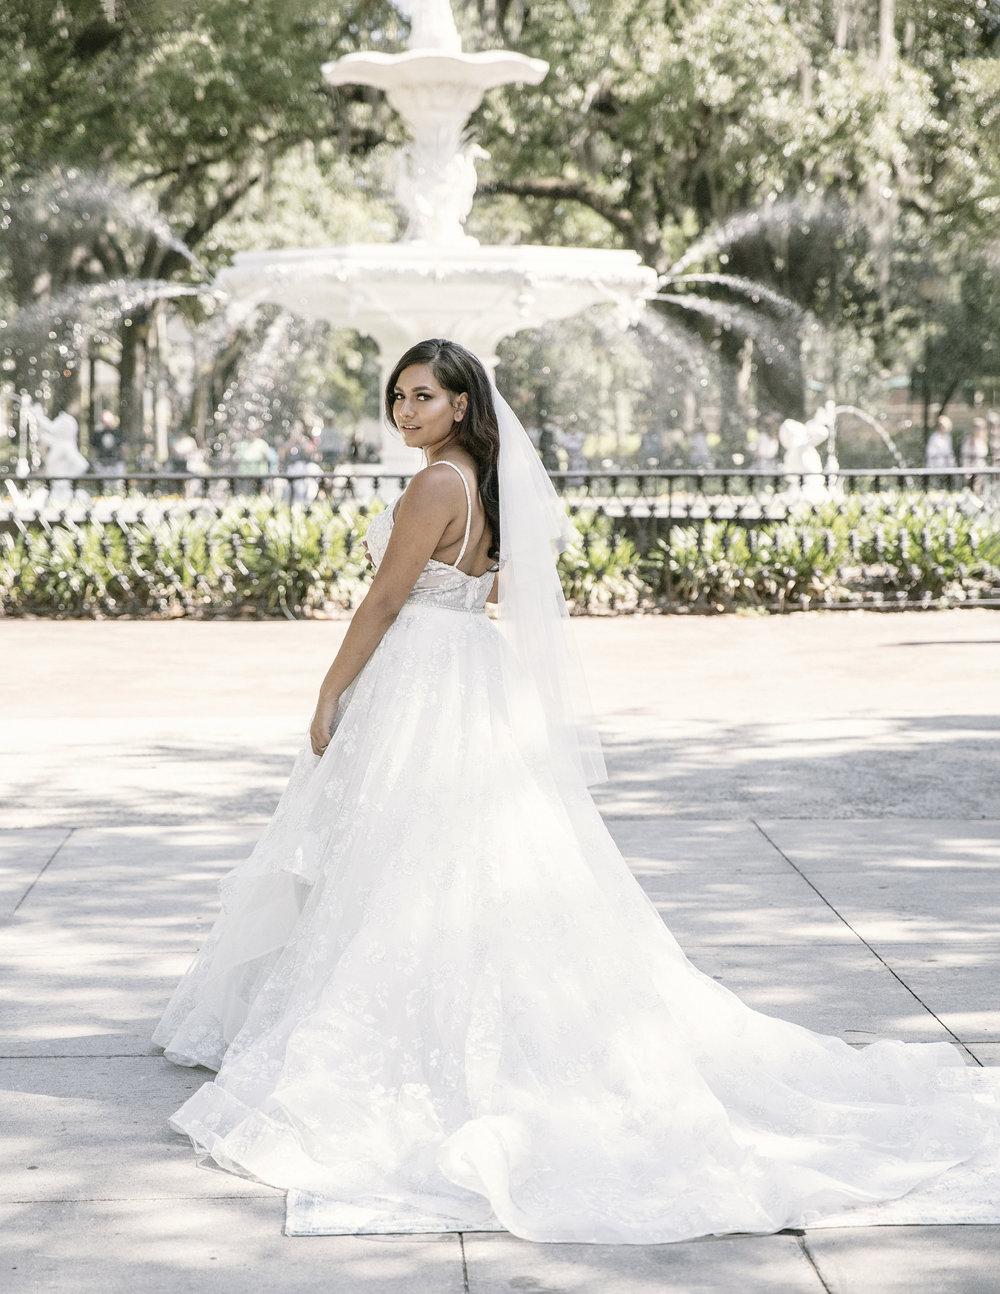 savannah-bridal-shop-unexpected-joys-of-wedding-planning-savannah-wedding-planning-gina-vogel-photography-savannah-weddings-2.jpg